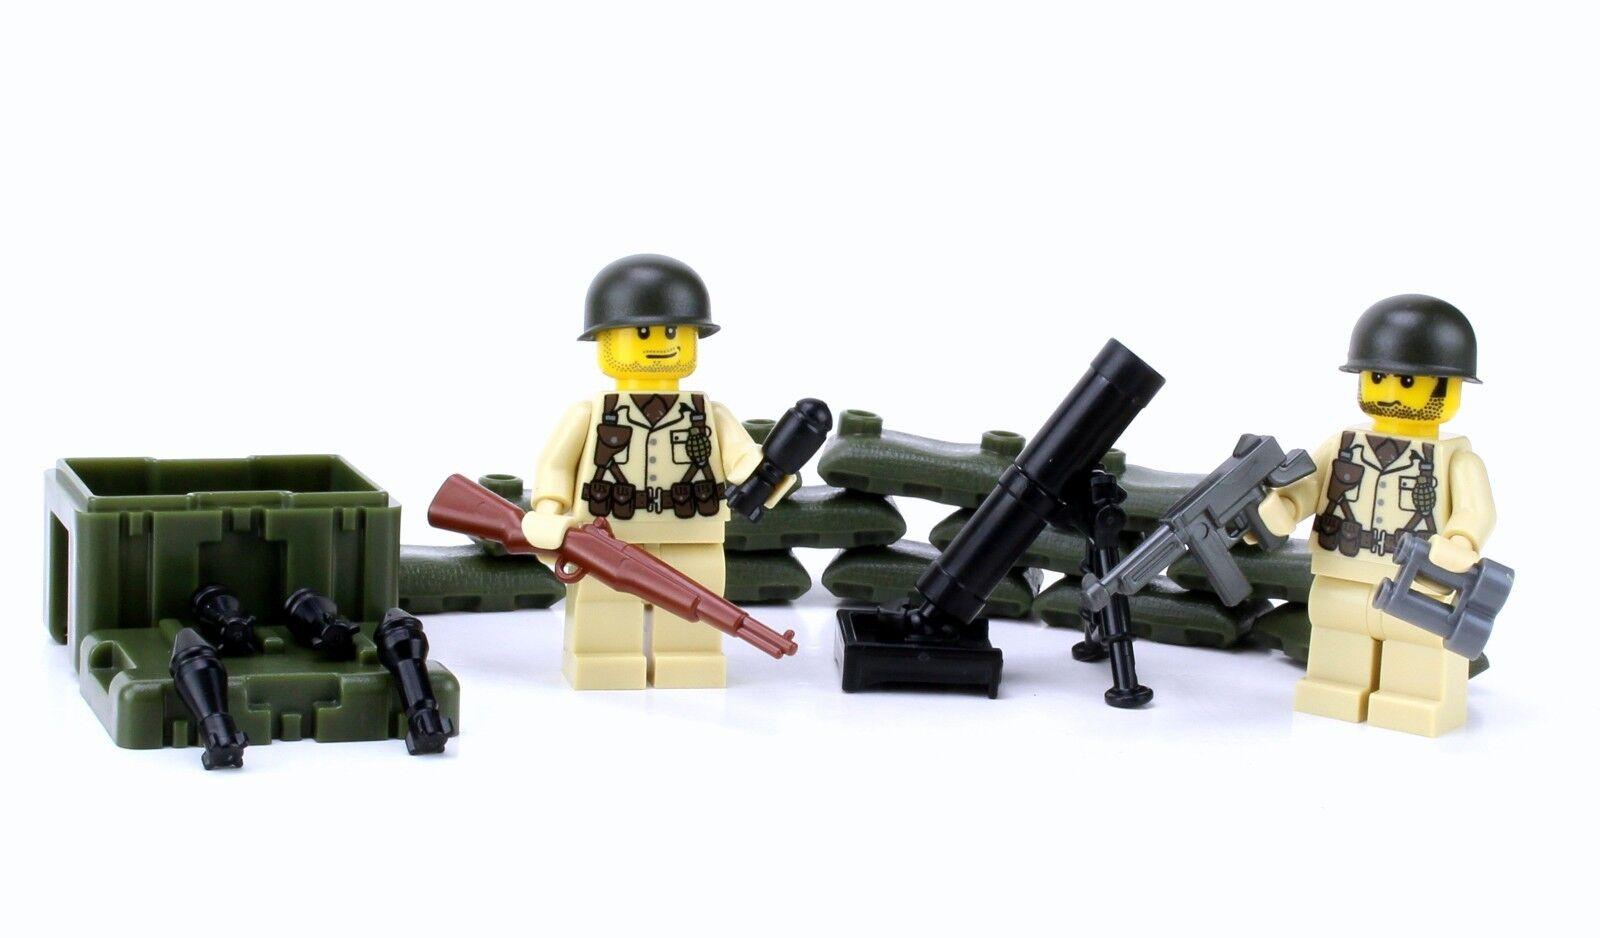 US Army WW2 Mortar team (SKU70)made with real LEGO® minifigures